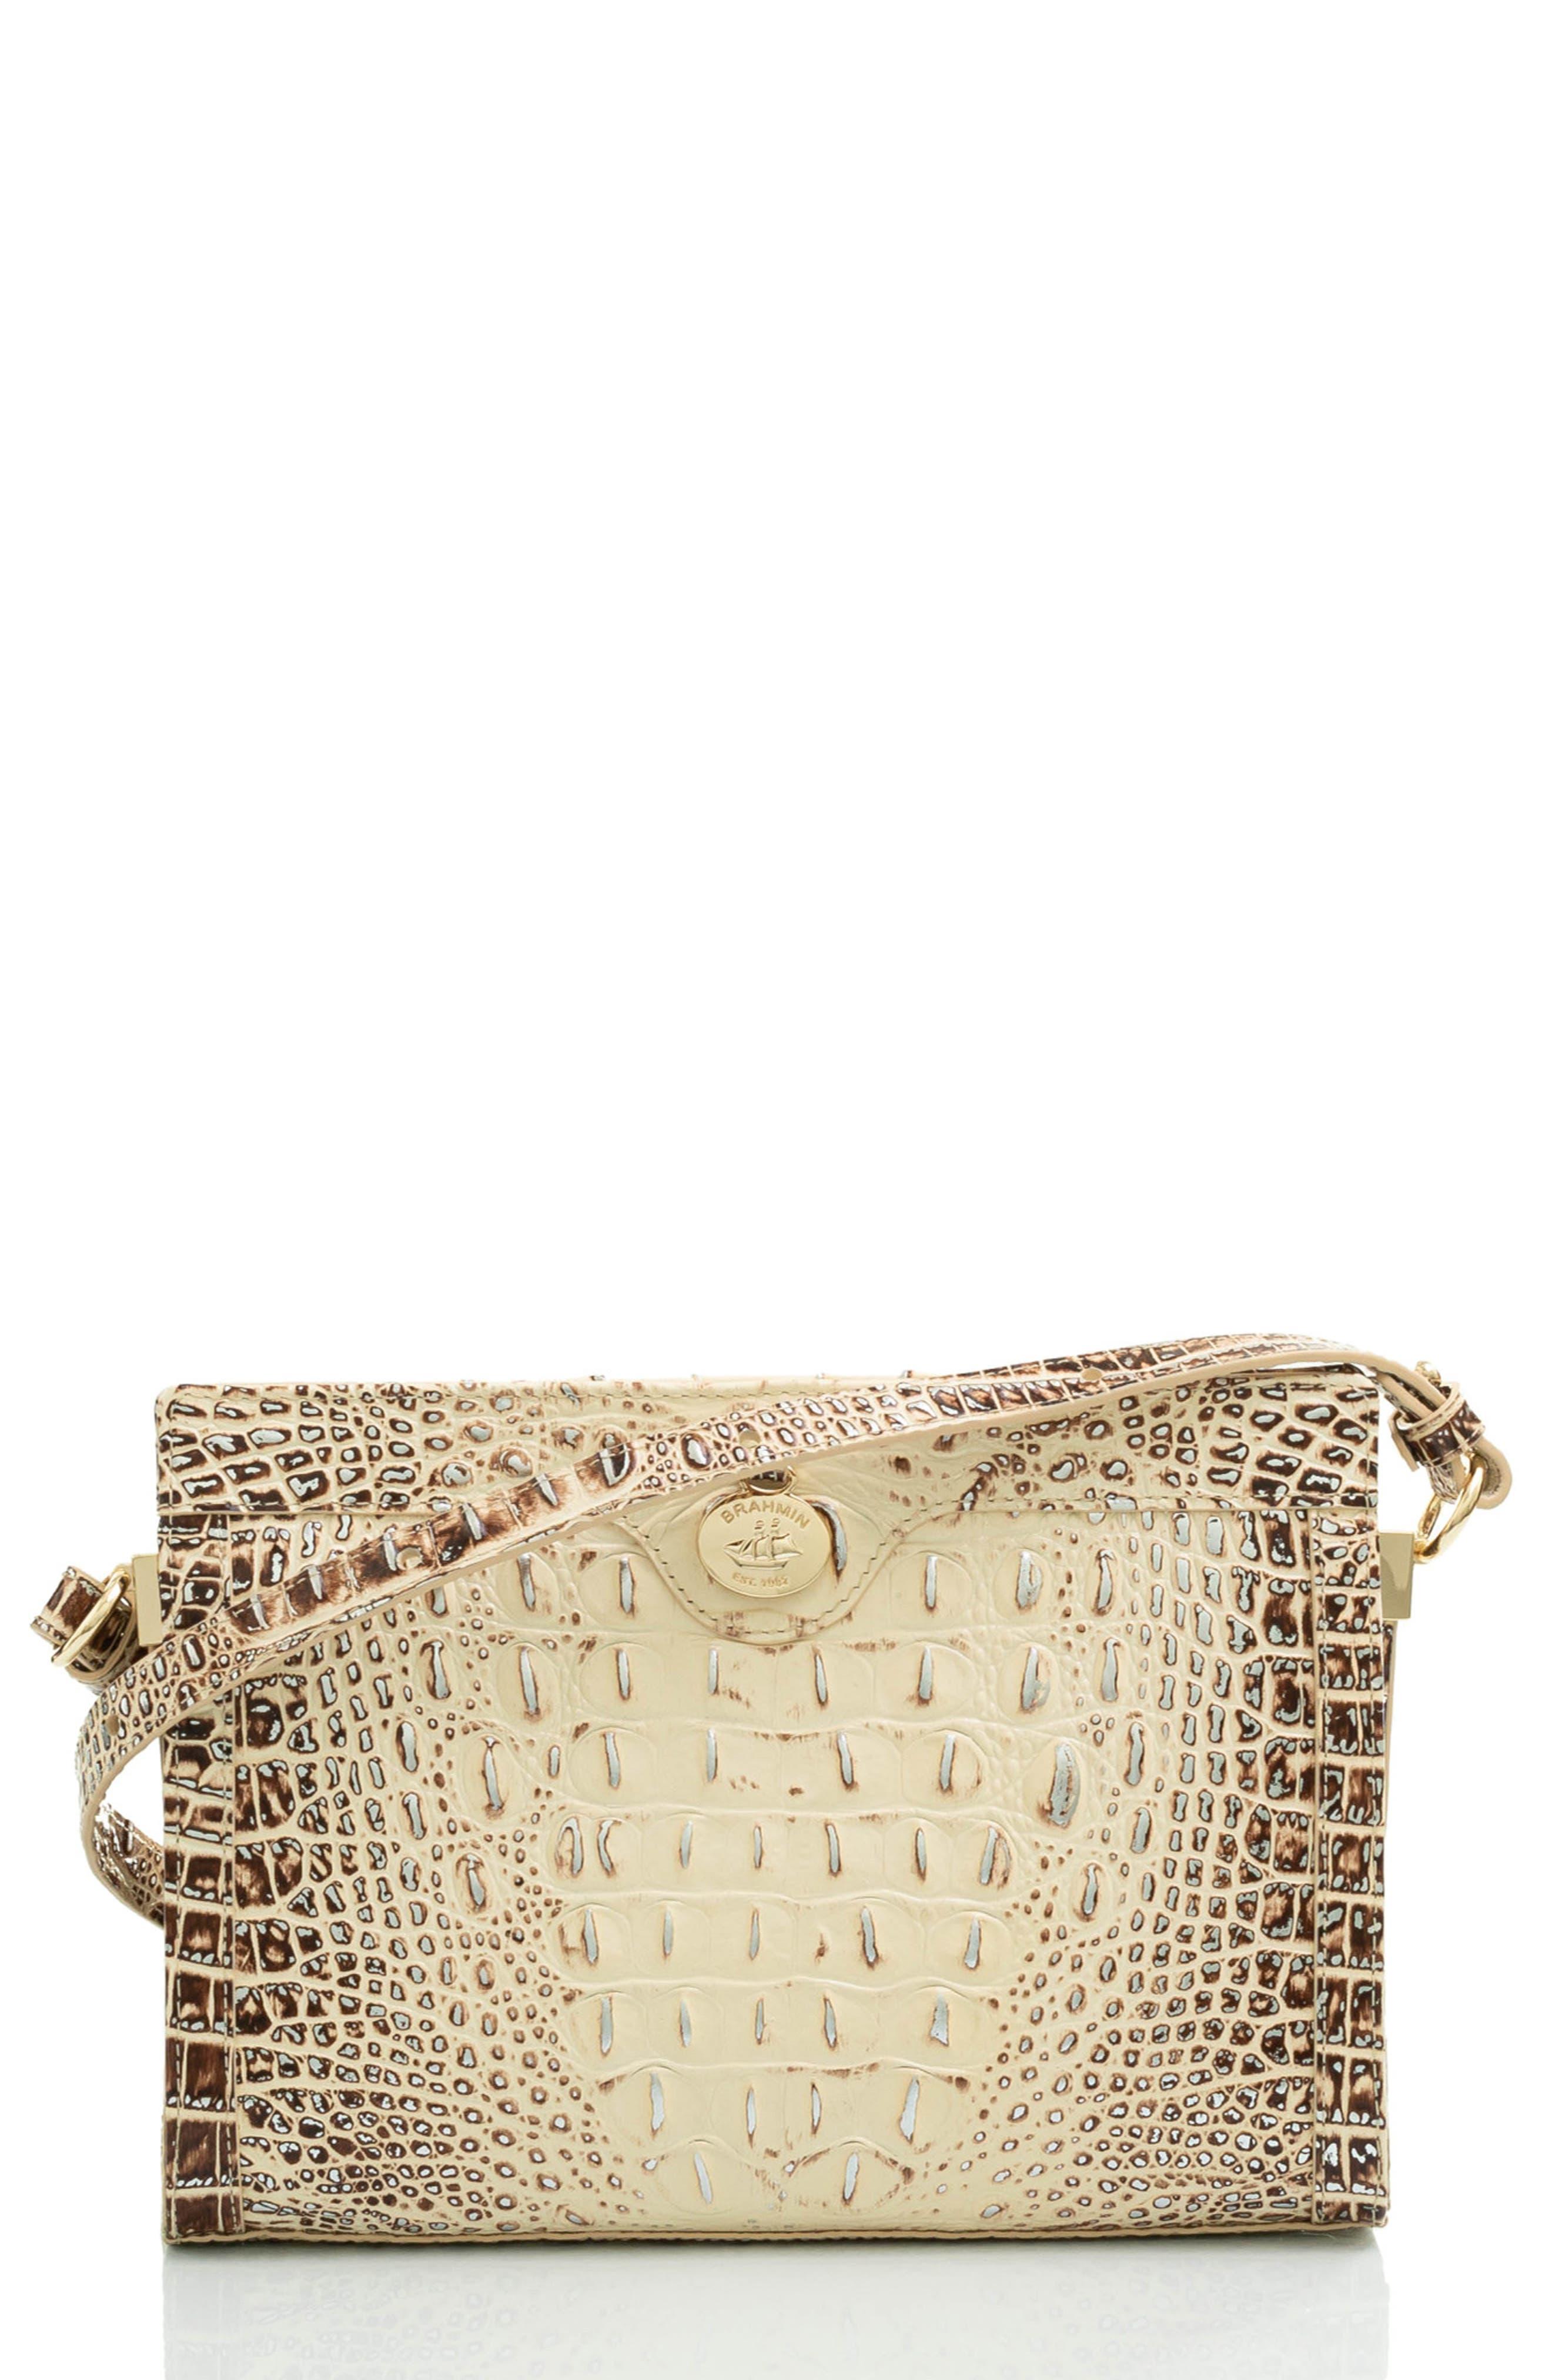 Alonna Croc Embossed Leather Crossbody Bag